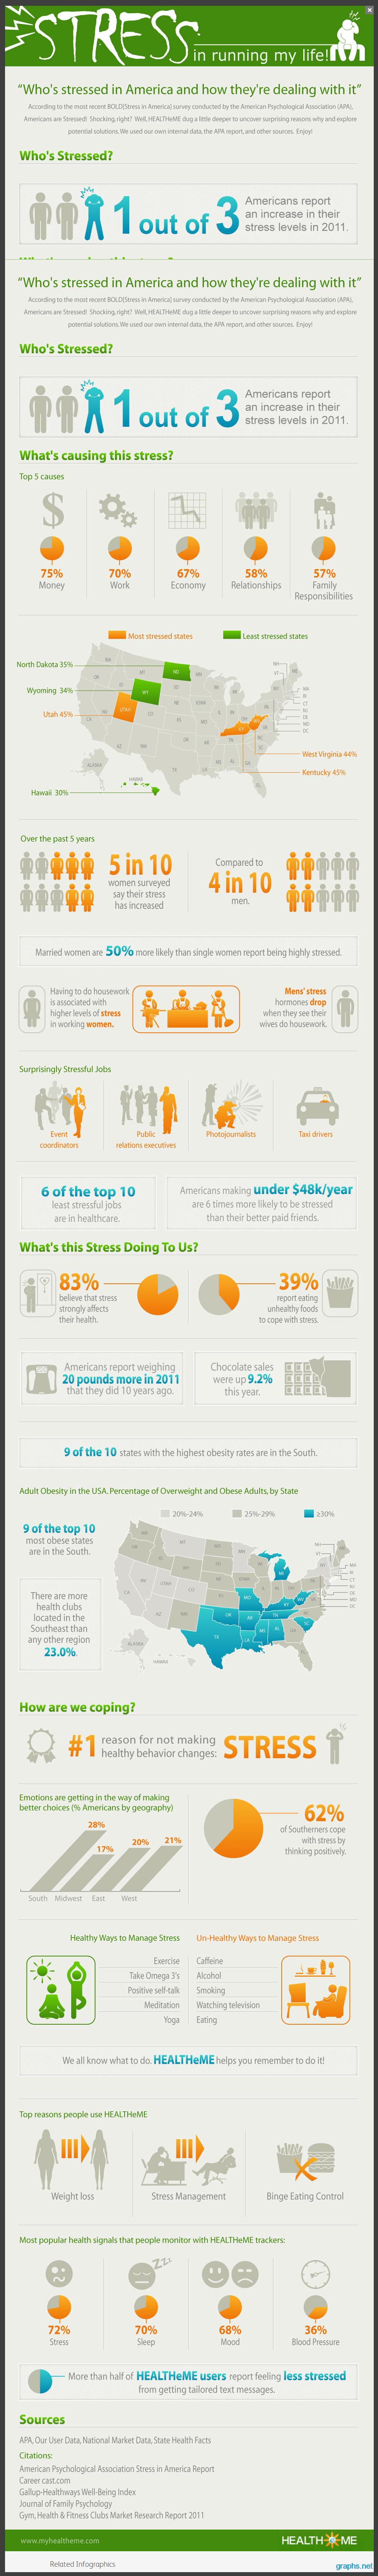 american stress statistics